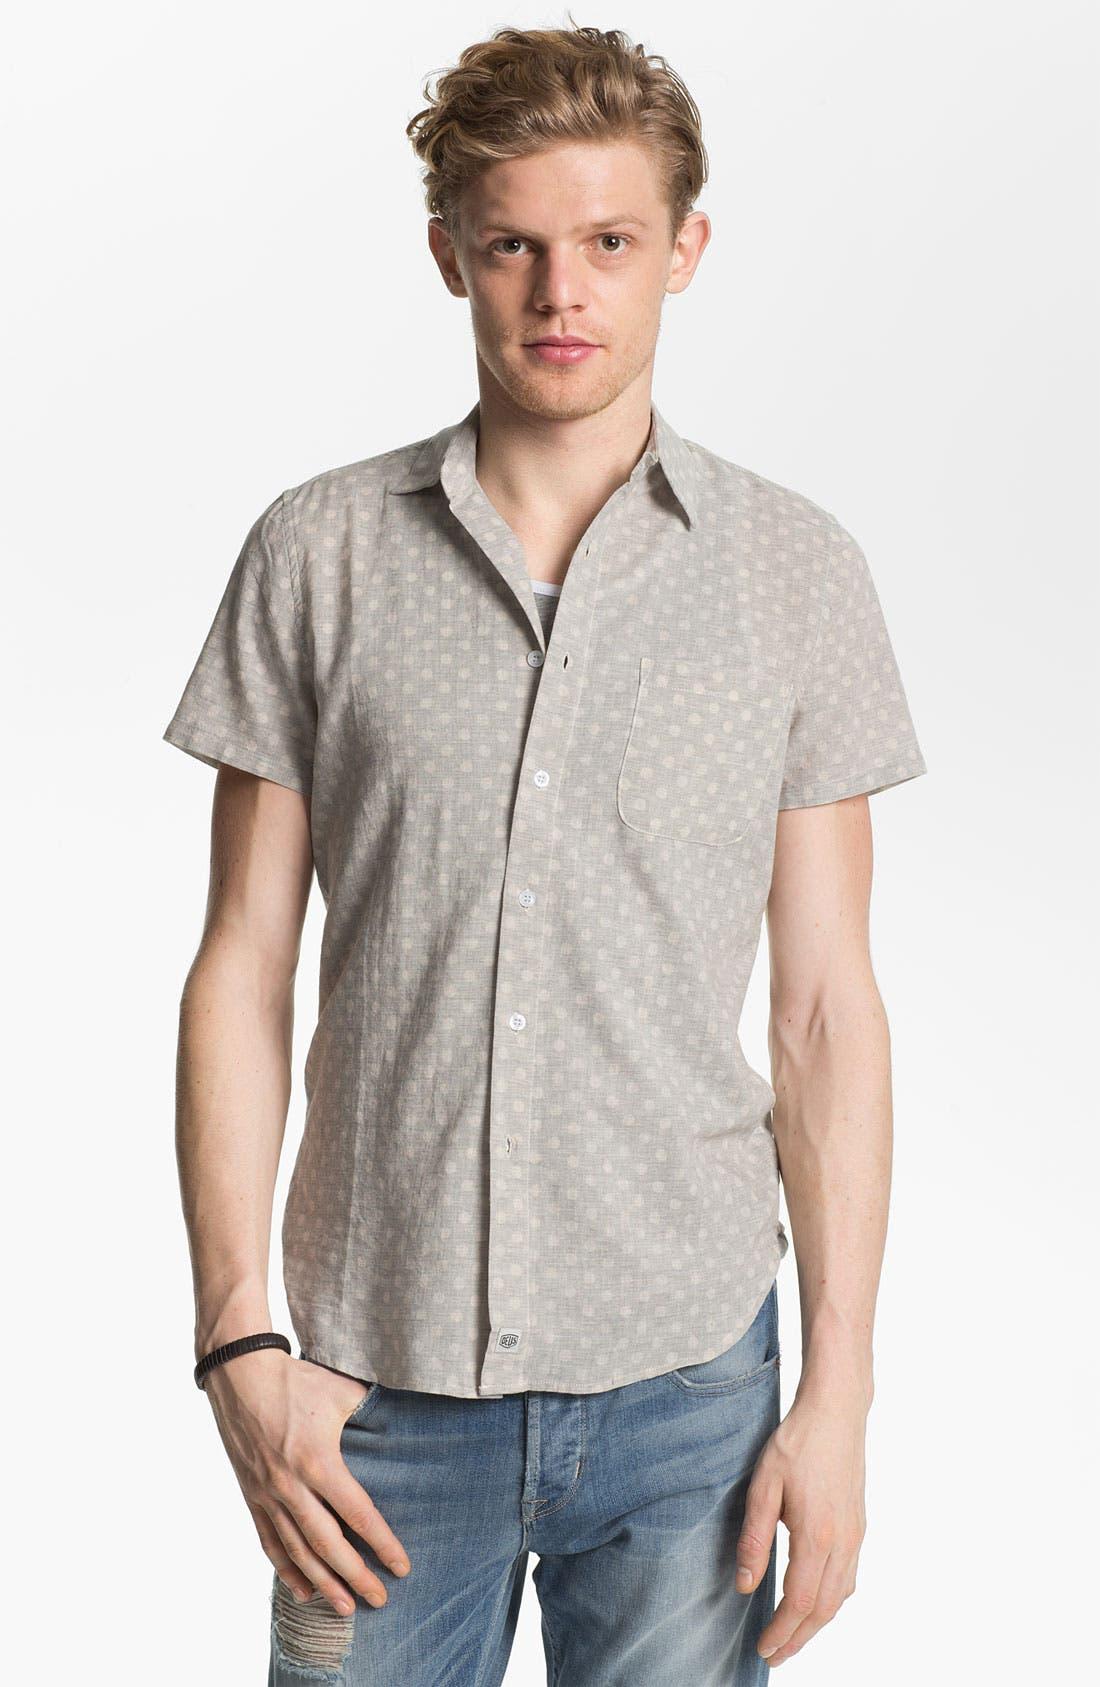 Main Image - Deus Ex Machina 'Billy' Dot Patterned Woven Shirt